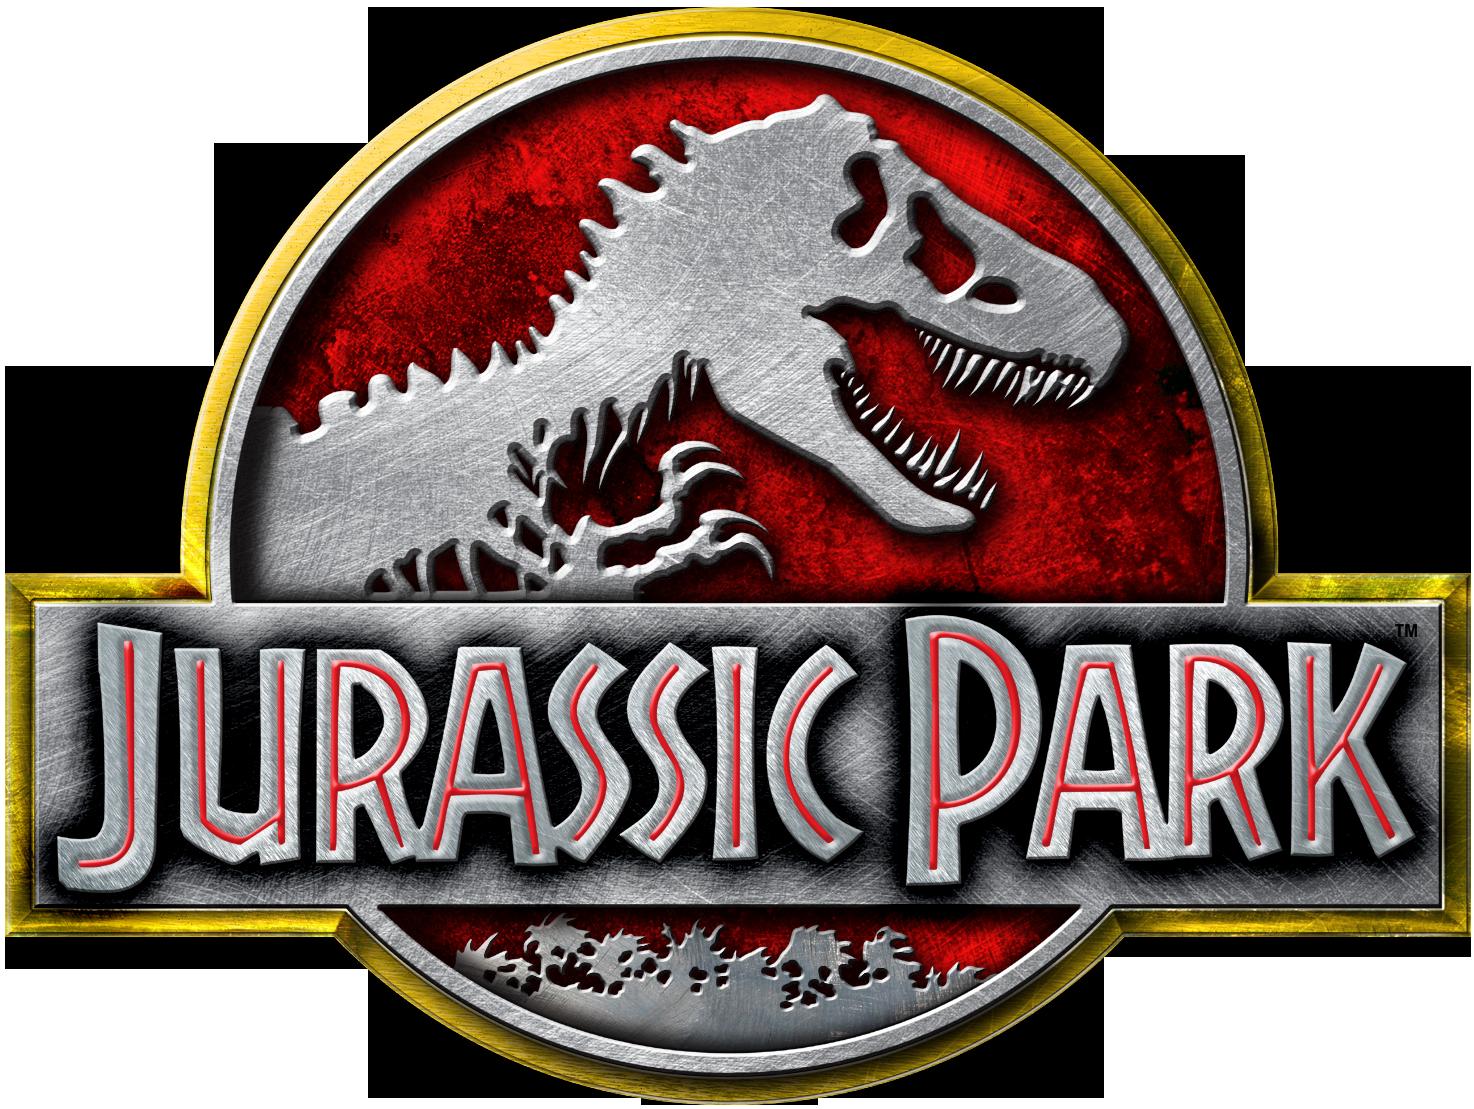 JurassicPark.png - Jurassic Park PNG